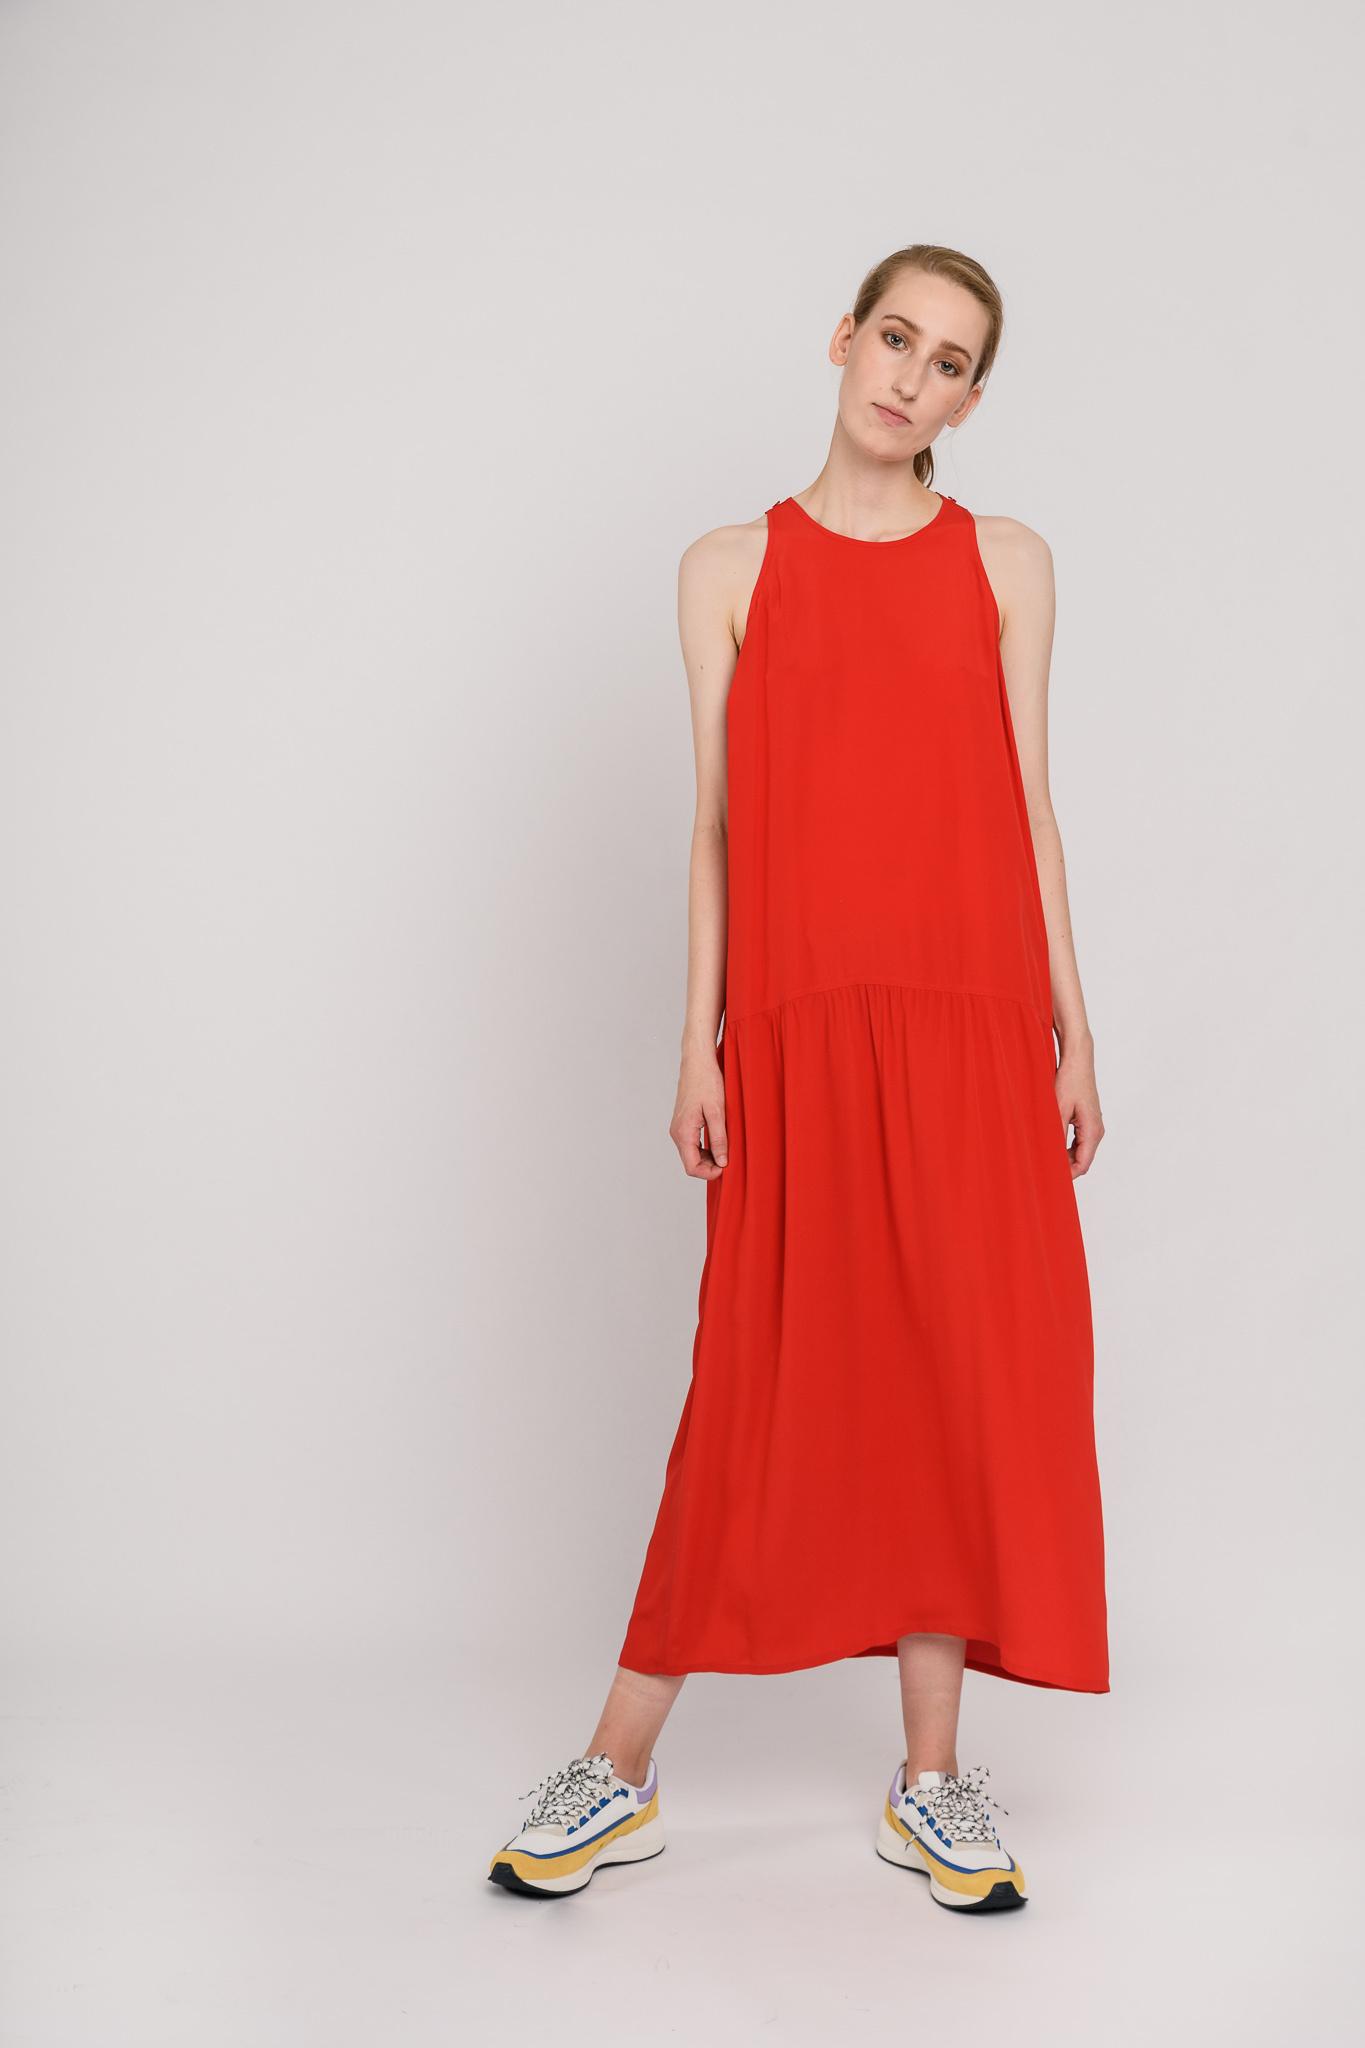 Daisy dress red silky